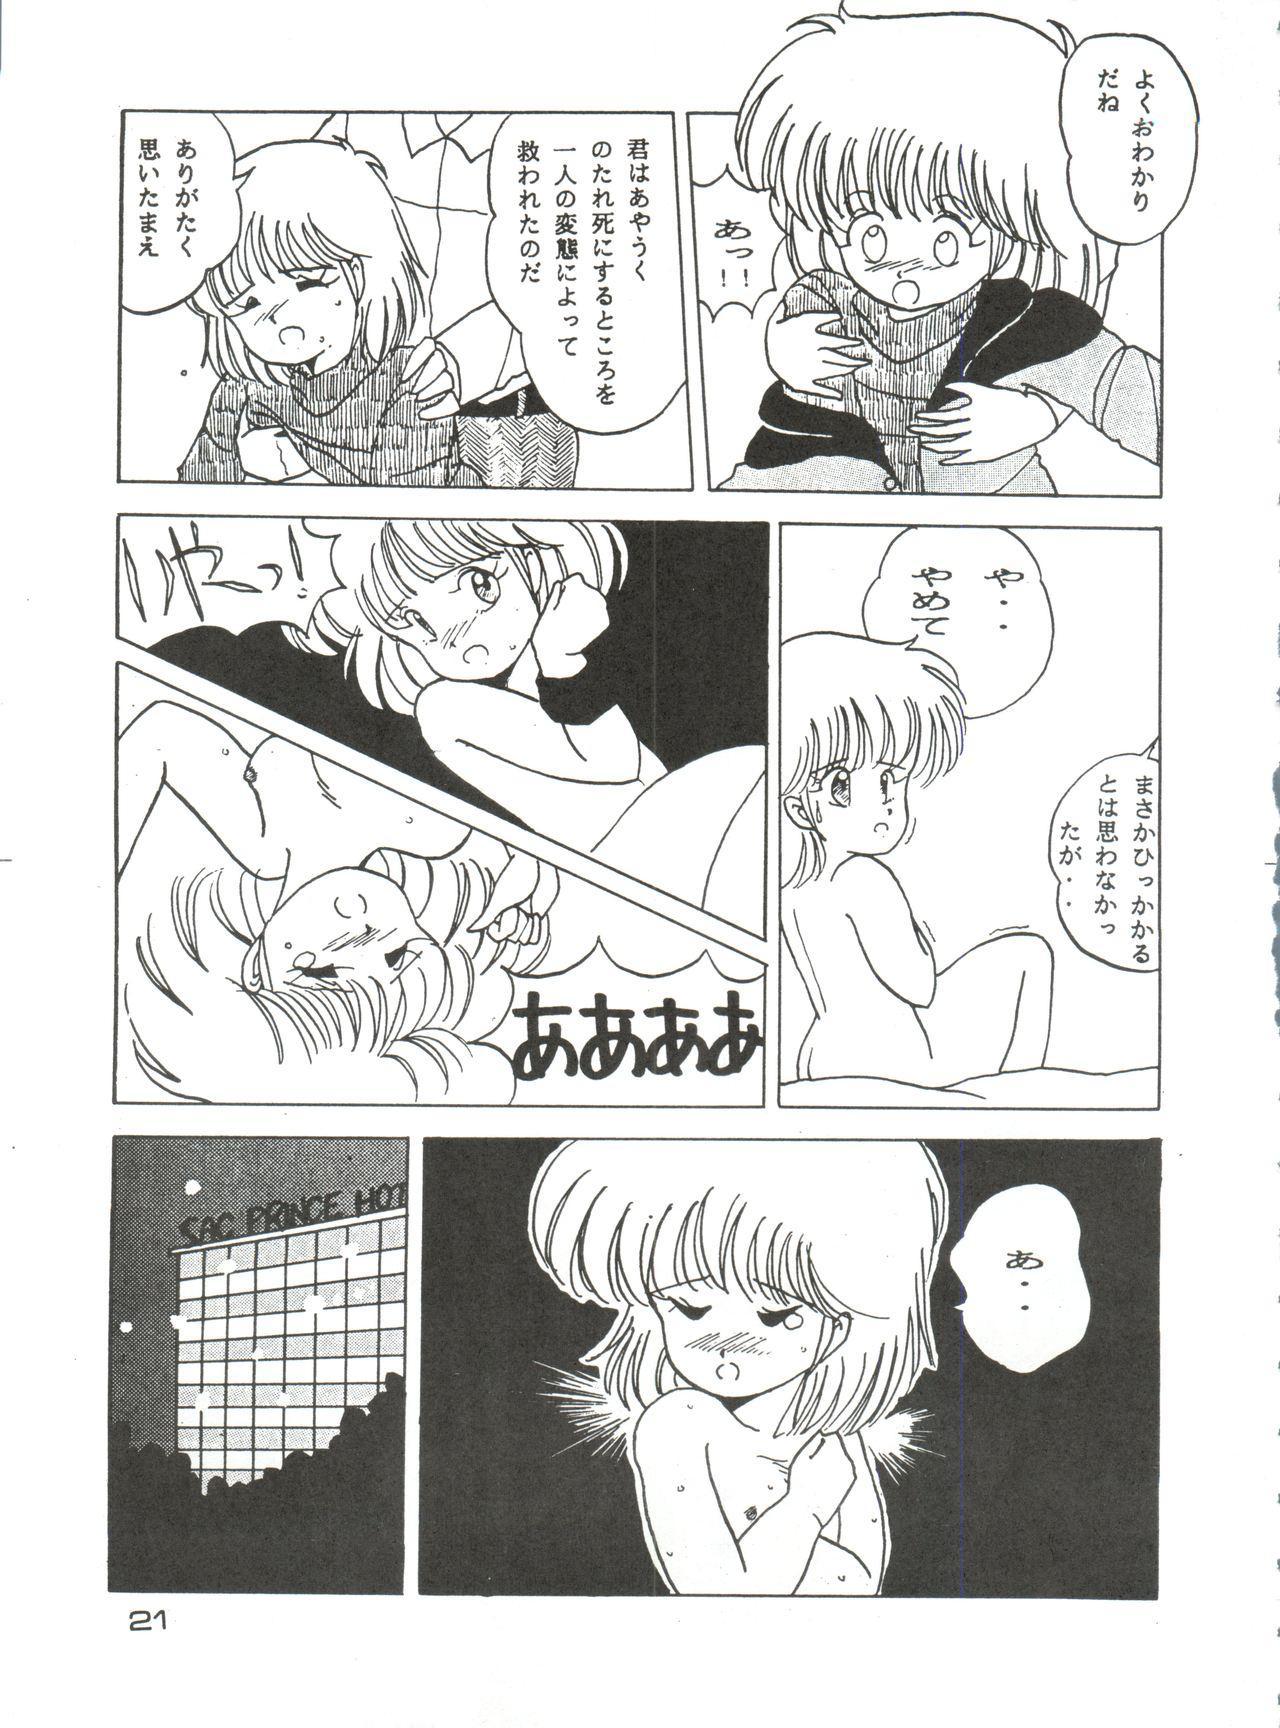 [Studio Fuck (Various) Onapet 7 (Sonic Soldier Borgman, Gundam ZZ, Osomatsu-kun) 20